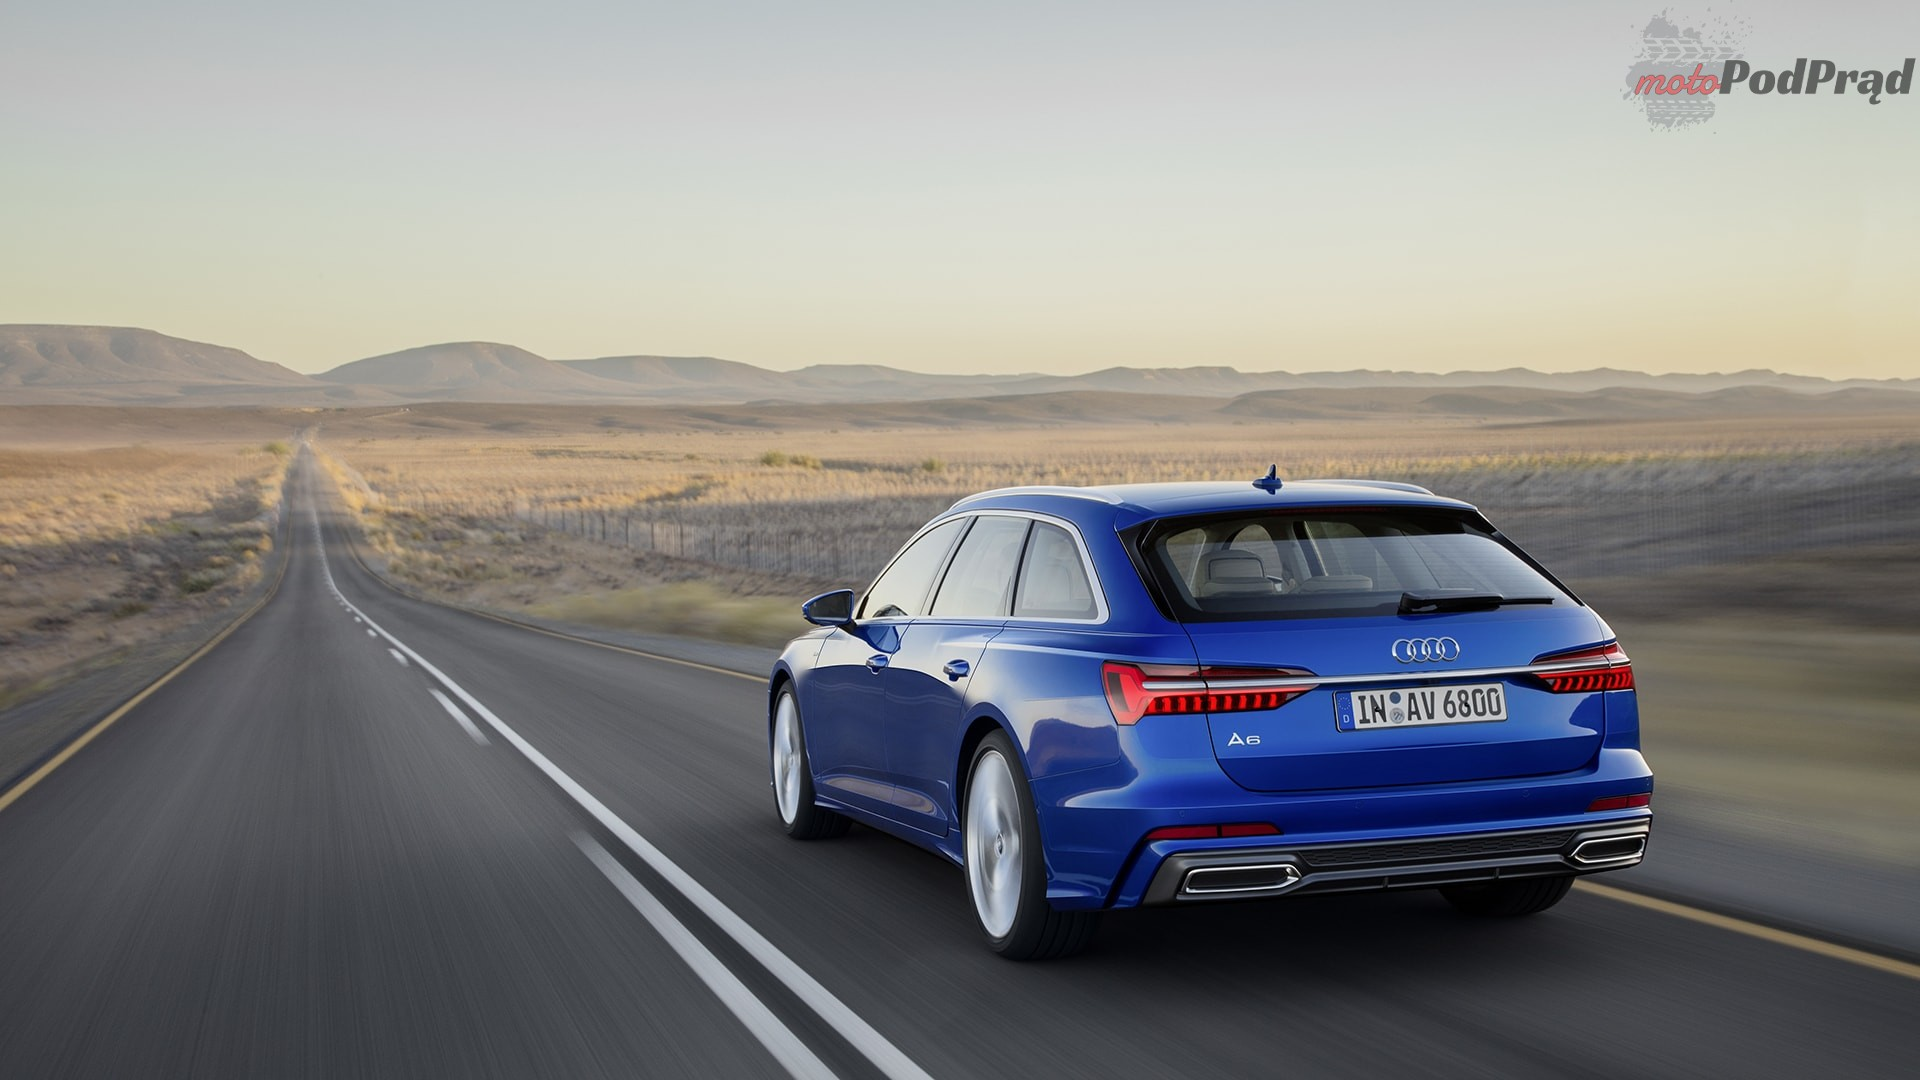 audi a6 avant 2019 9 Audi prezentuje nowe A6 Avant